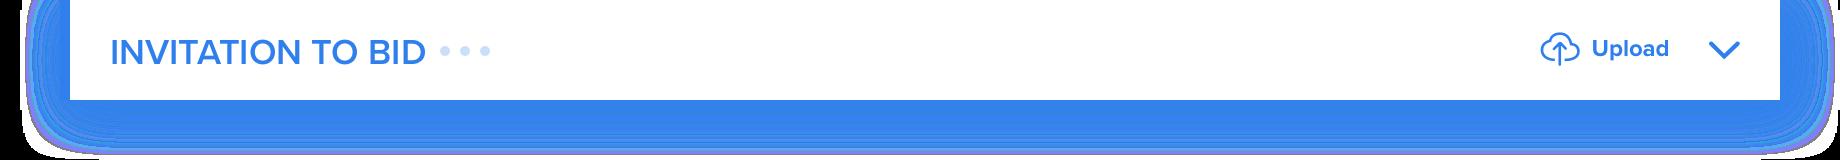 Image showing response digital tender